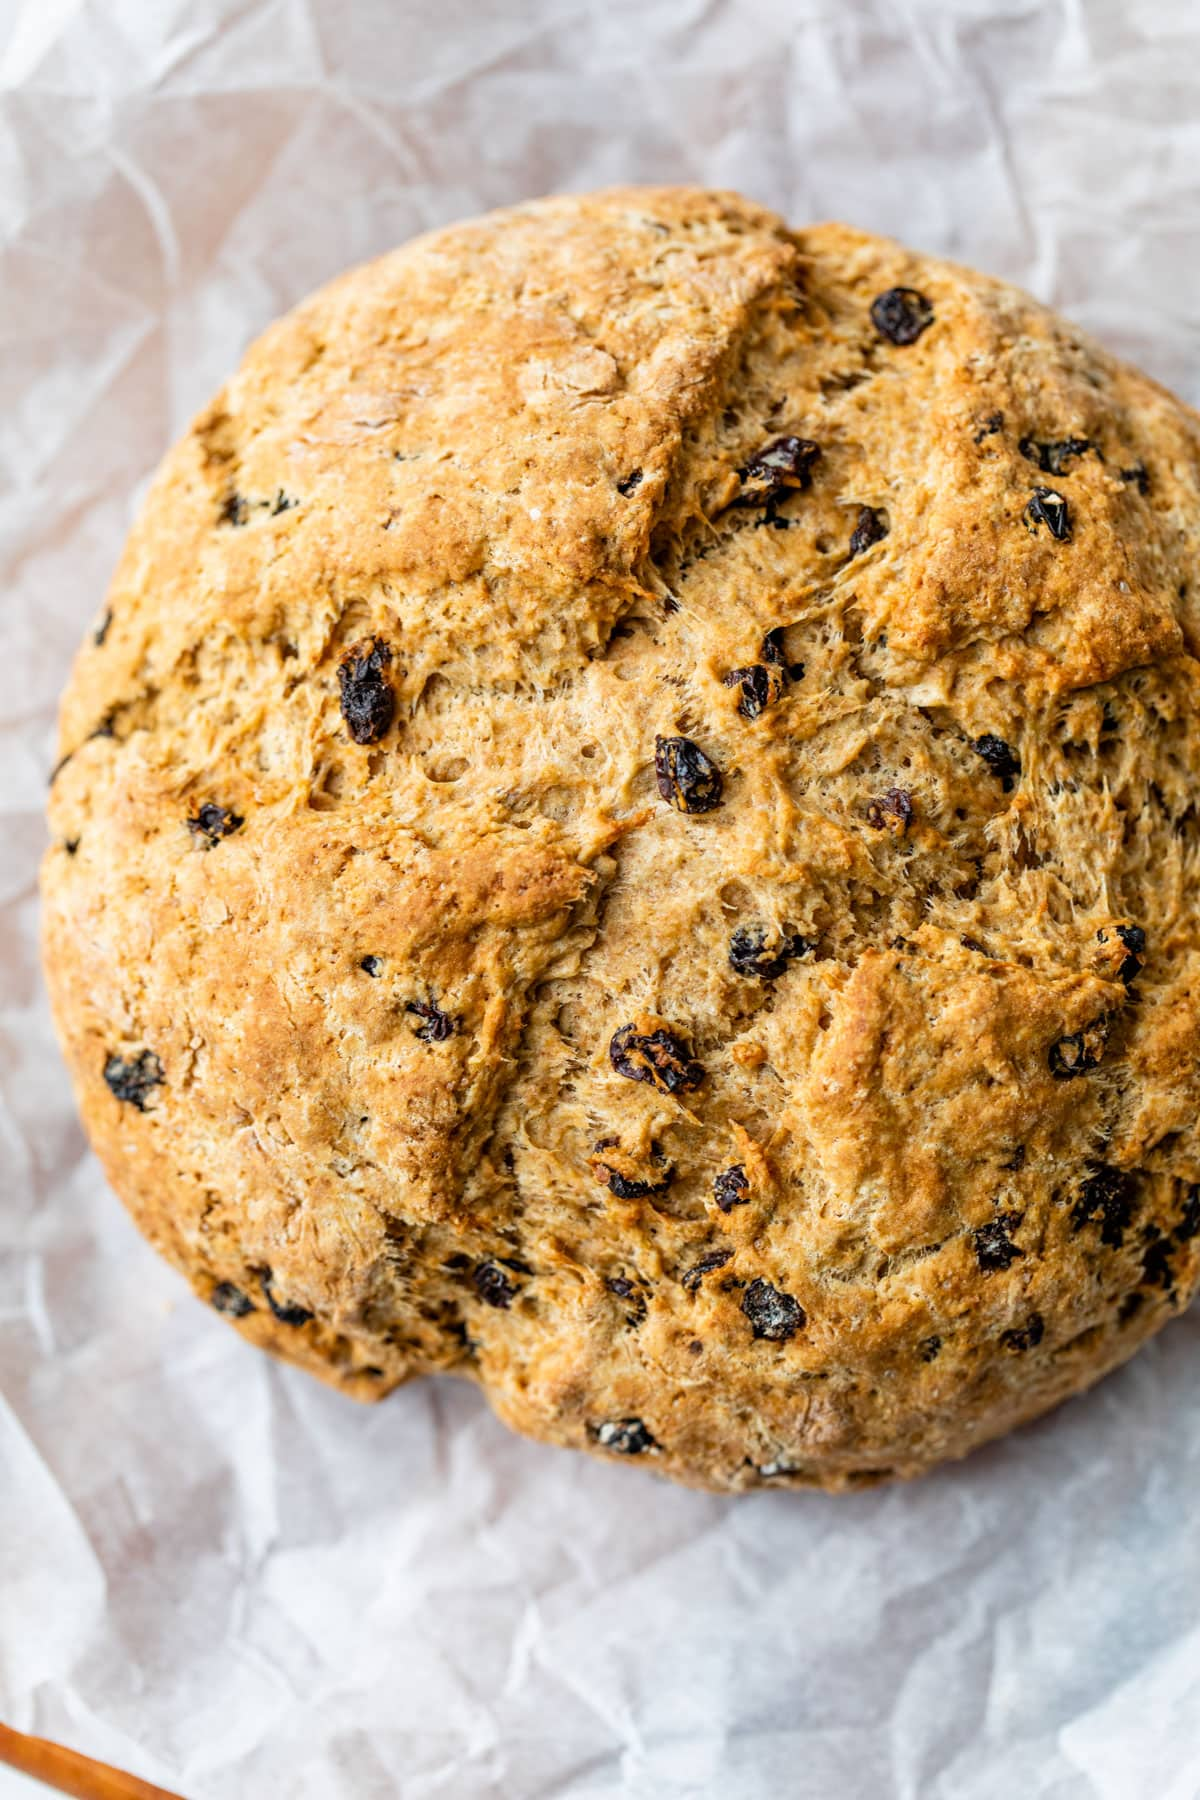 Whole Wheat Irish Soda Bread. This easy Irish soda bread recipe is a must make for St. Patrick's Day